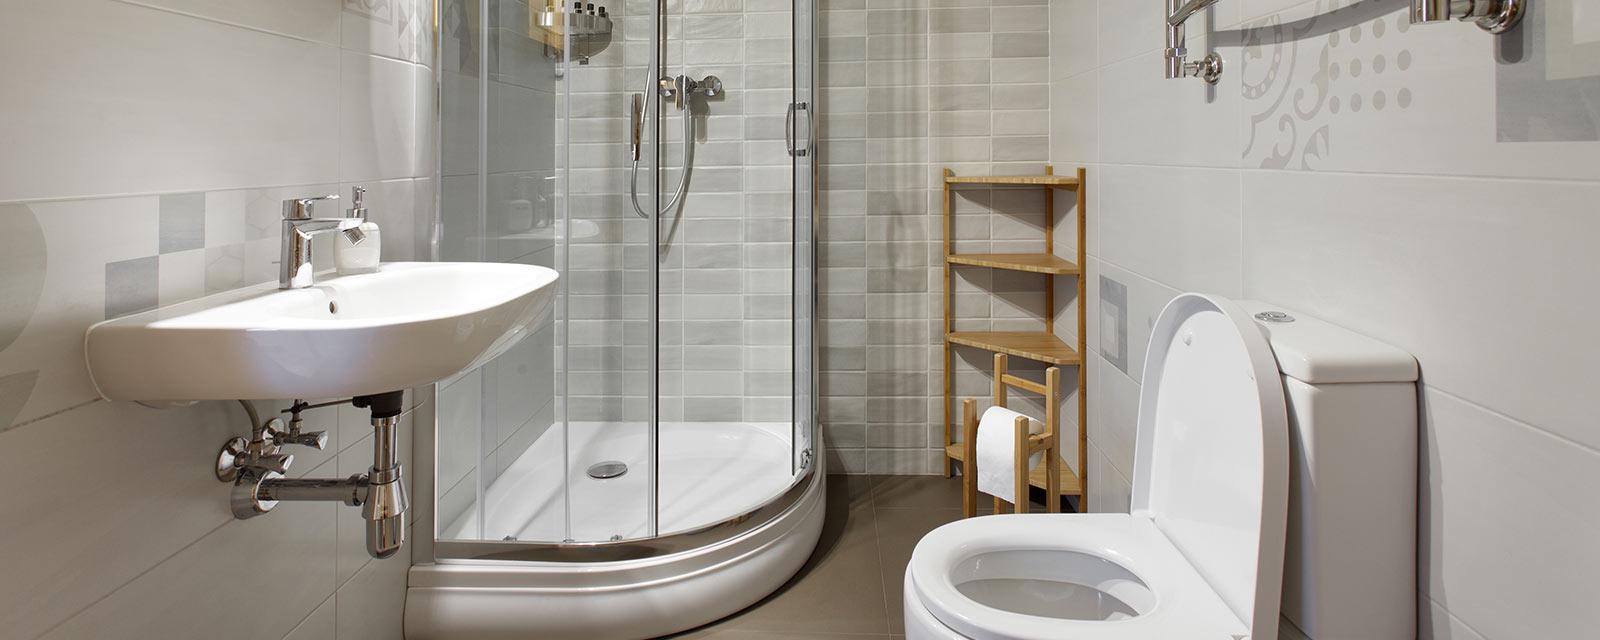 Conseils : aménager une petite salle de bains  Guide Artisan